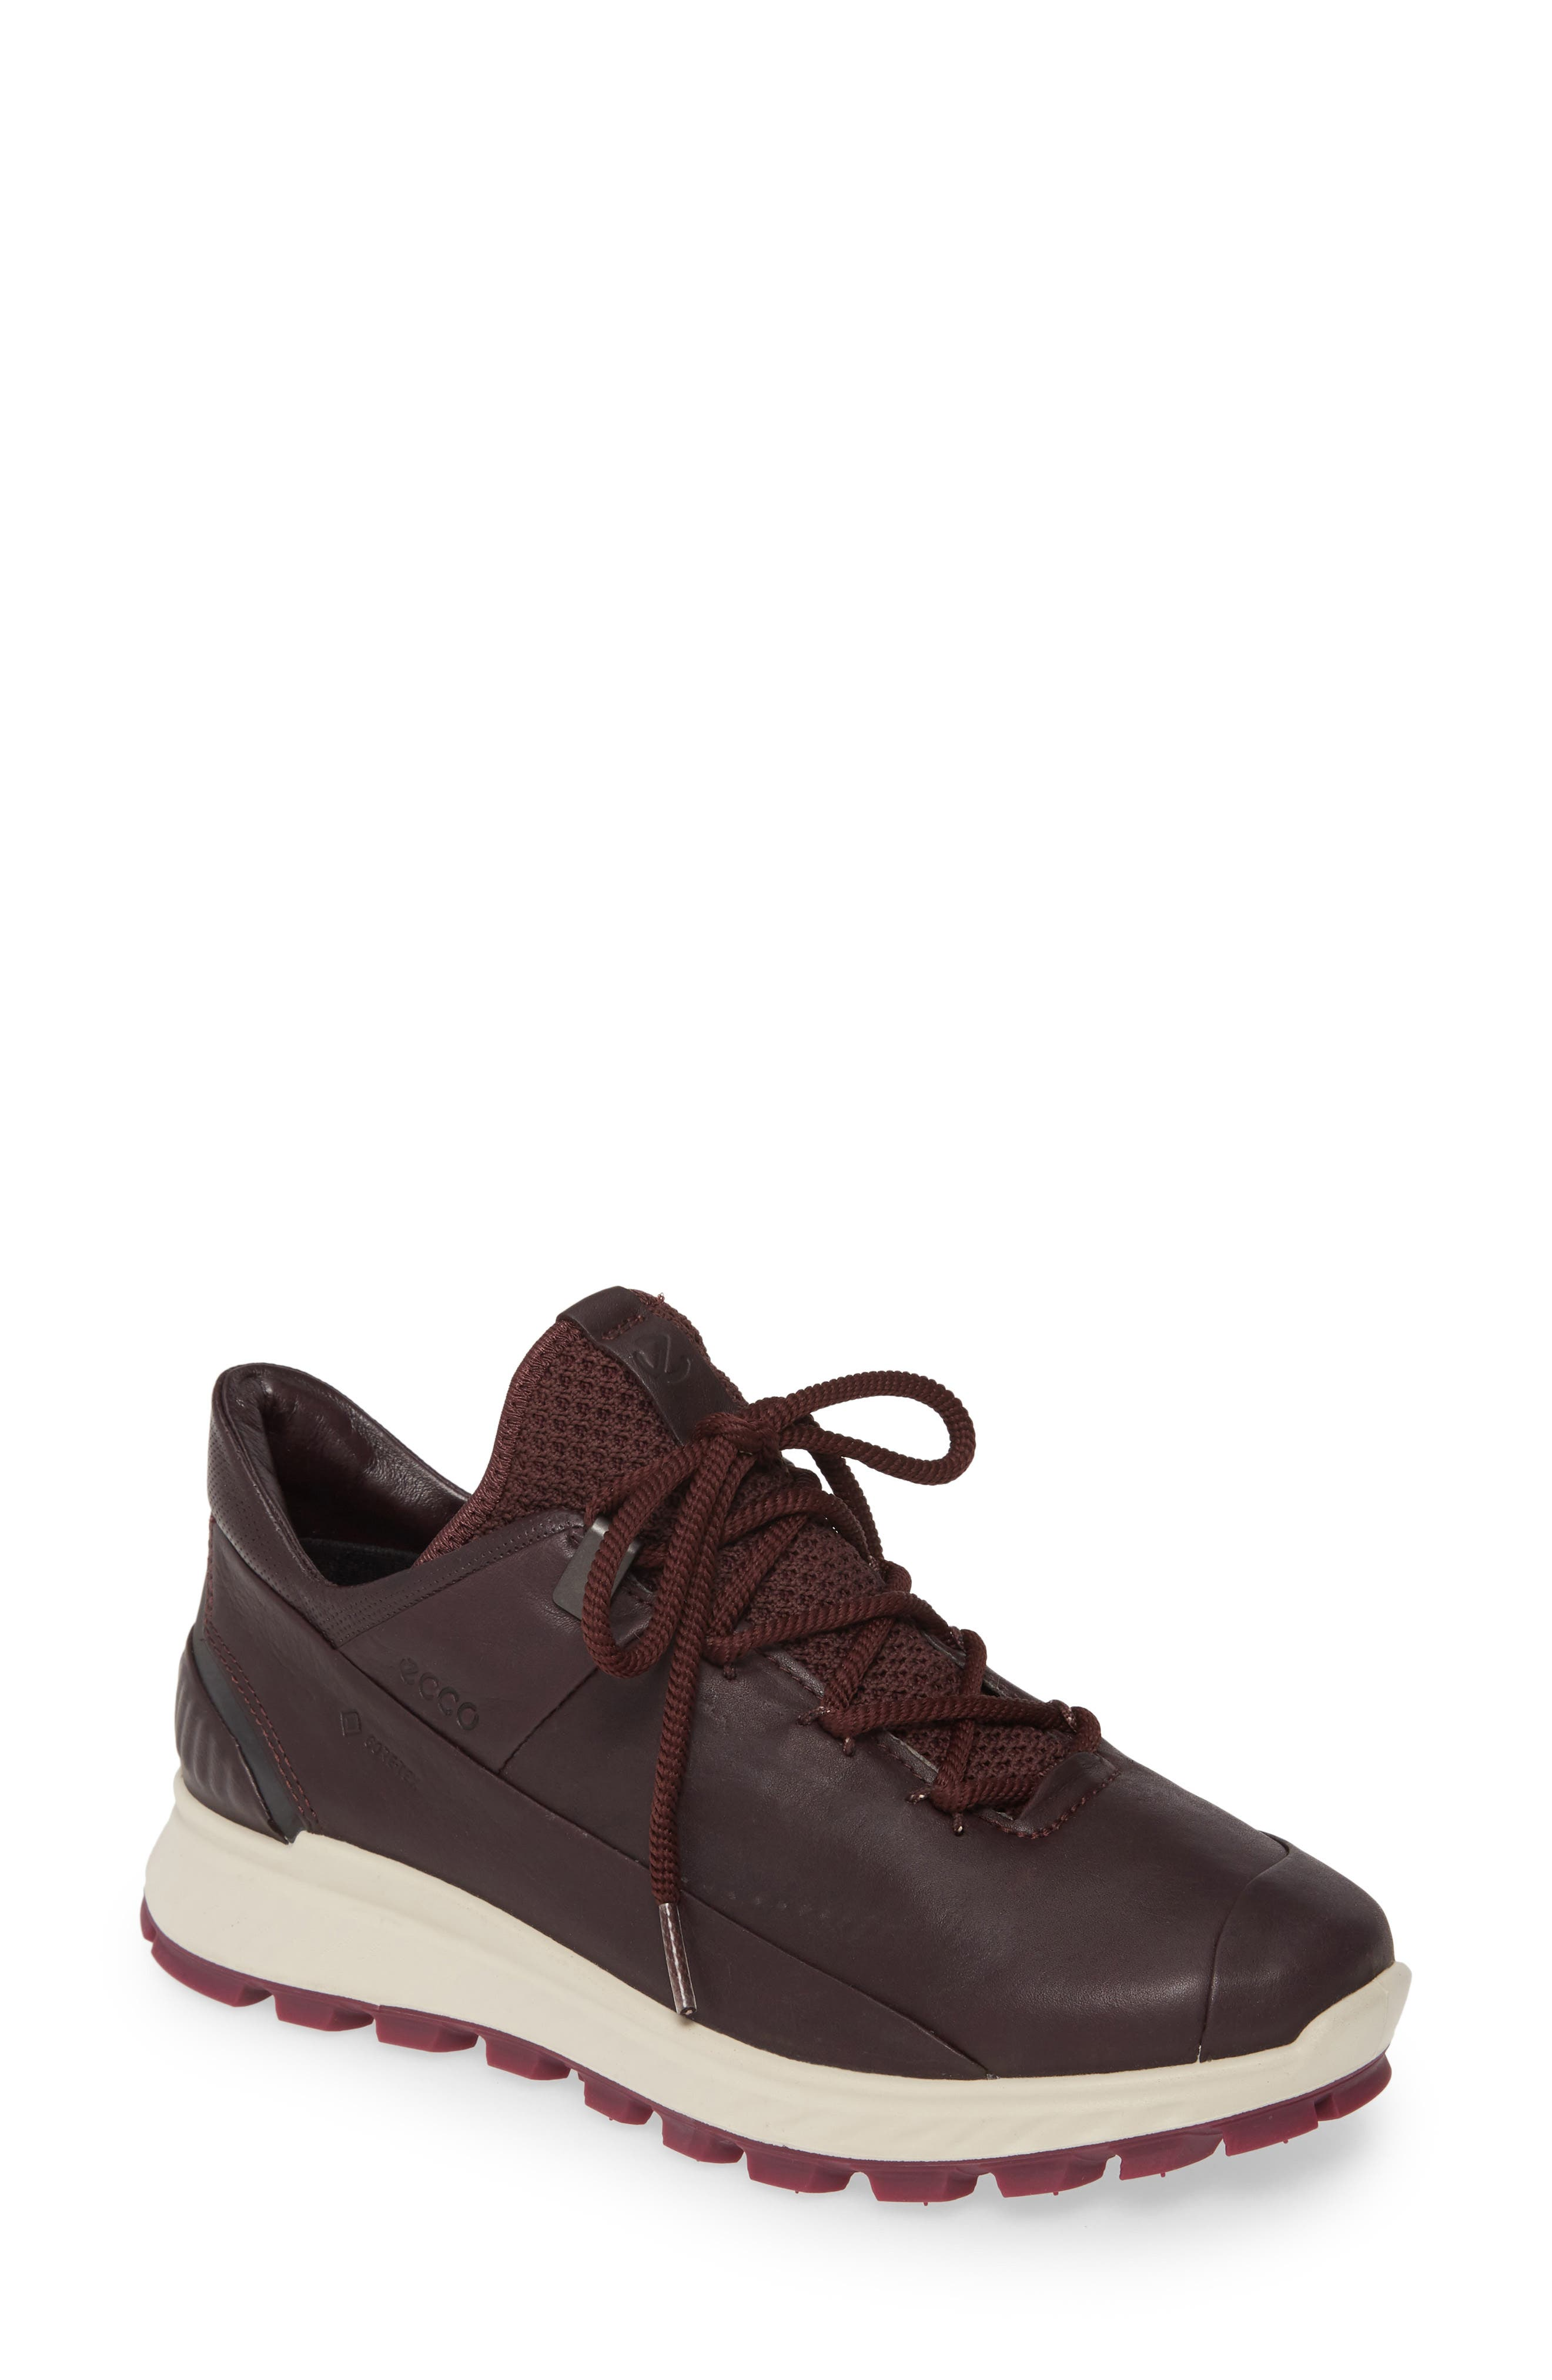 Ecco Exostrike Gore-Tex Sneaker, Burgundy